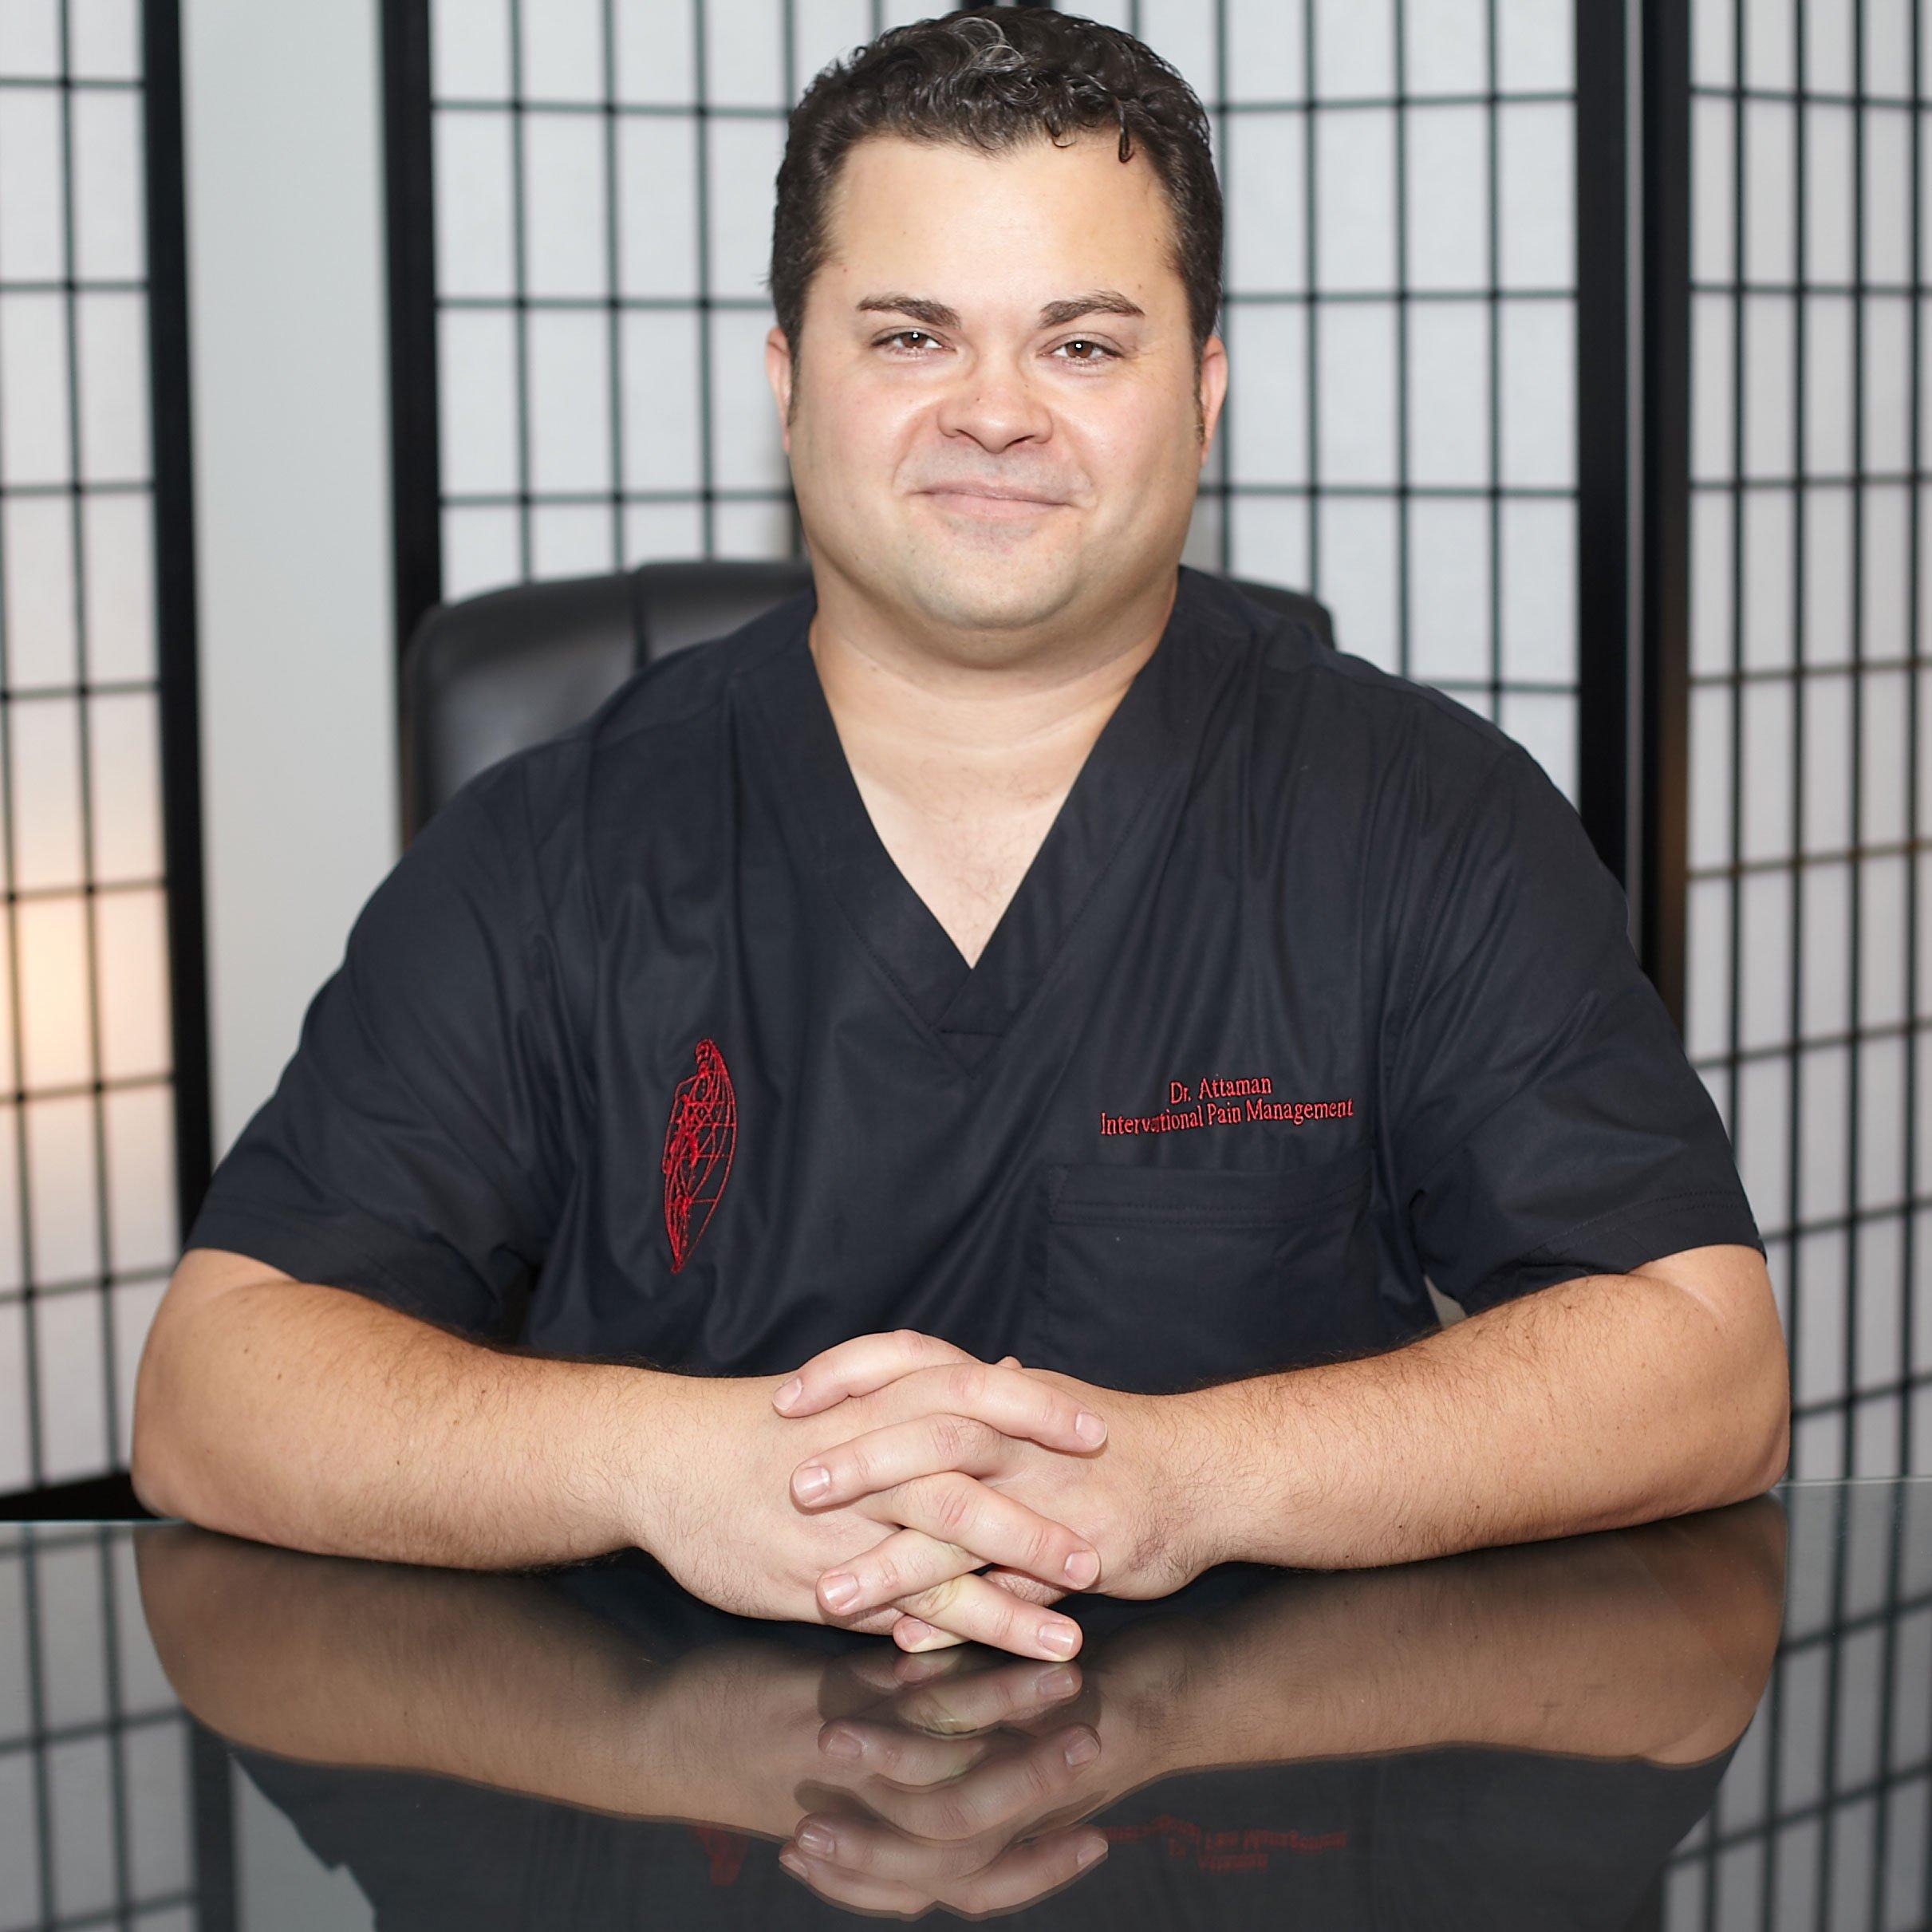 Dr. Jason G. Attaman